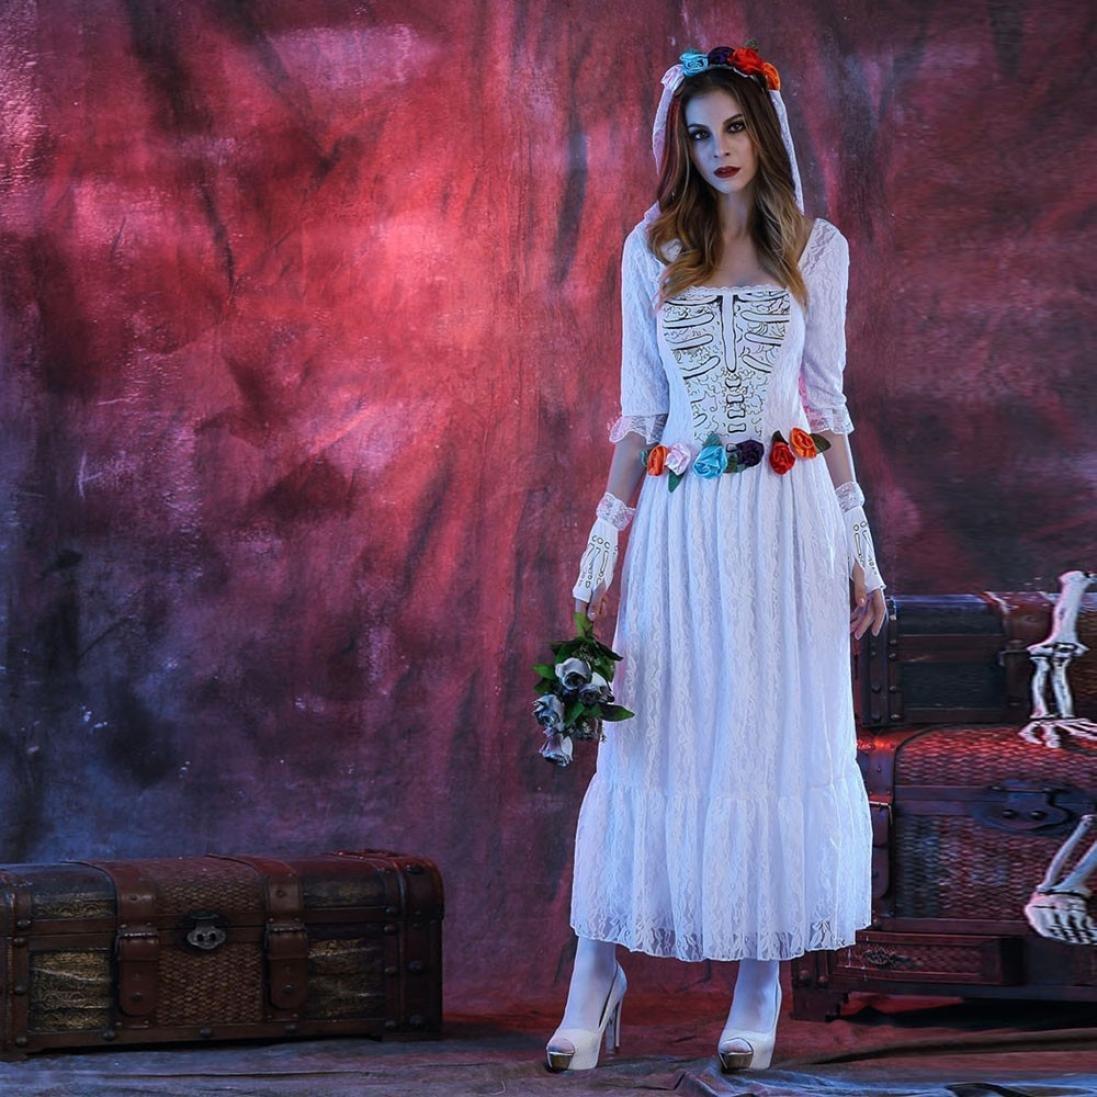 yiwula mujeres vestido de novia cadáver disfraz de Halloween cosplay ...